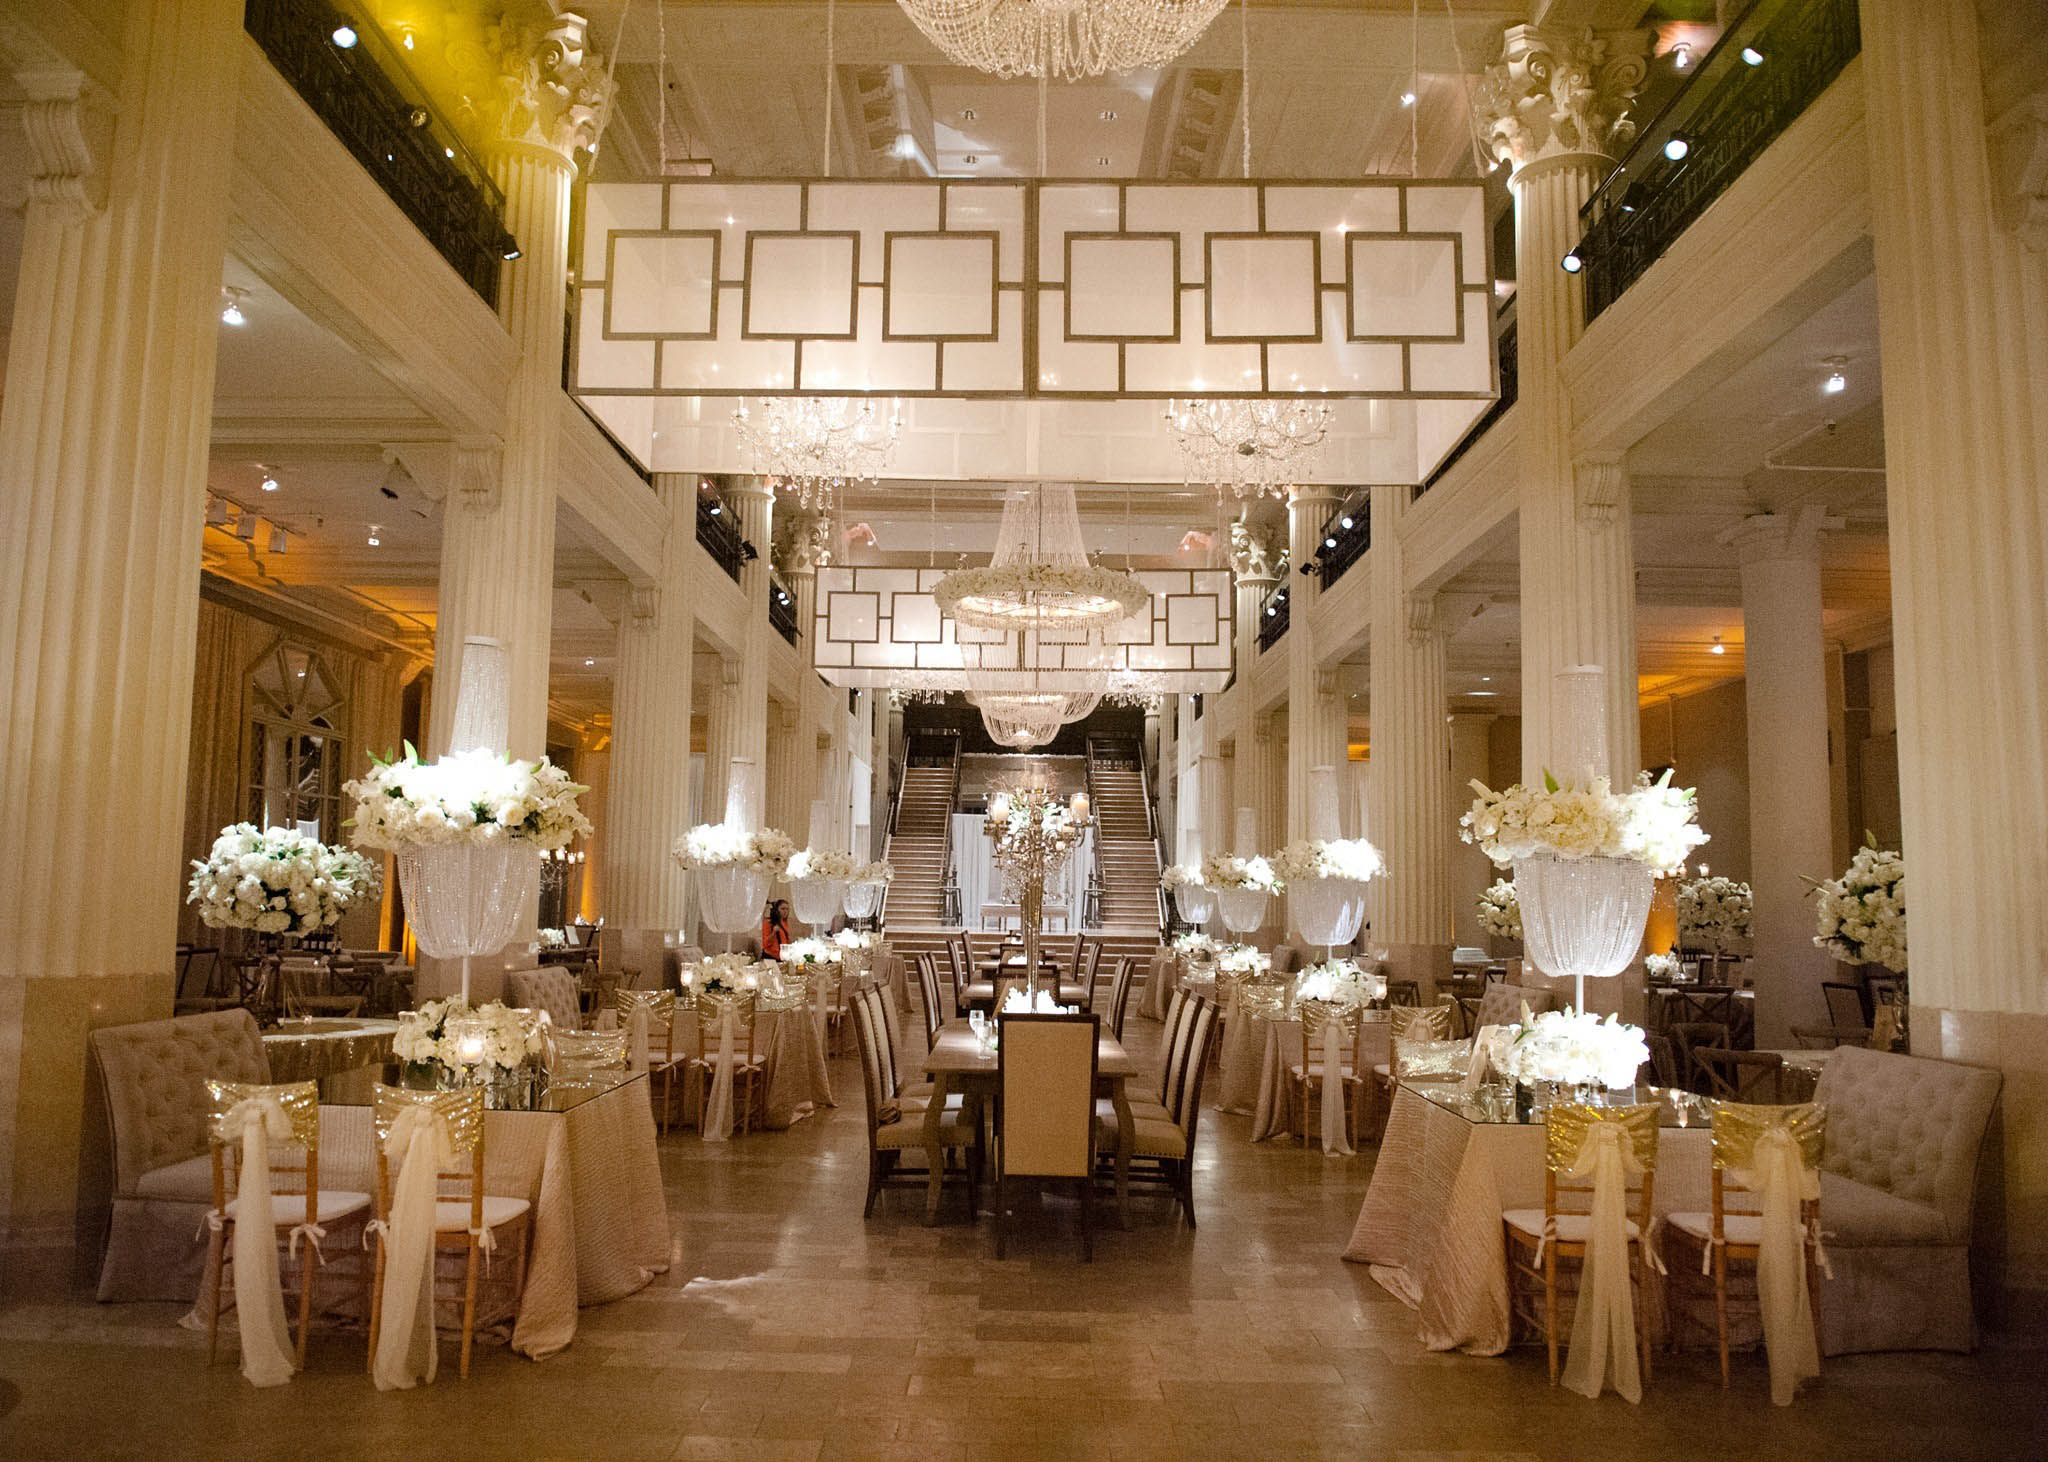 Wedding venue decoration images  Beautiful White and Gold Wedding Decor  Darryl Co  Photo Lauren